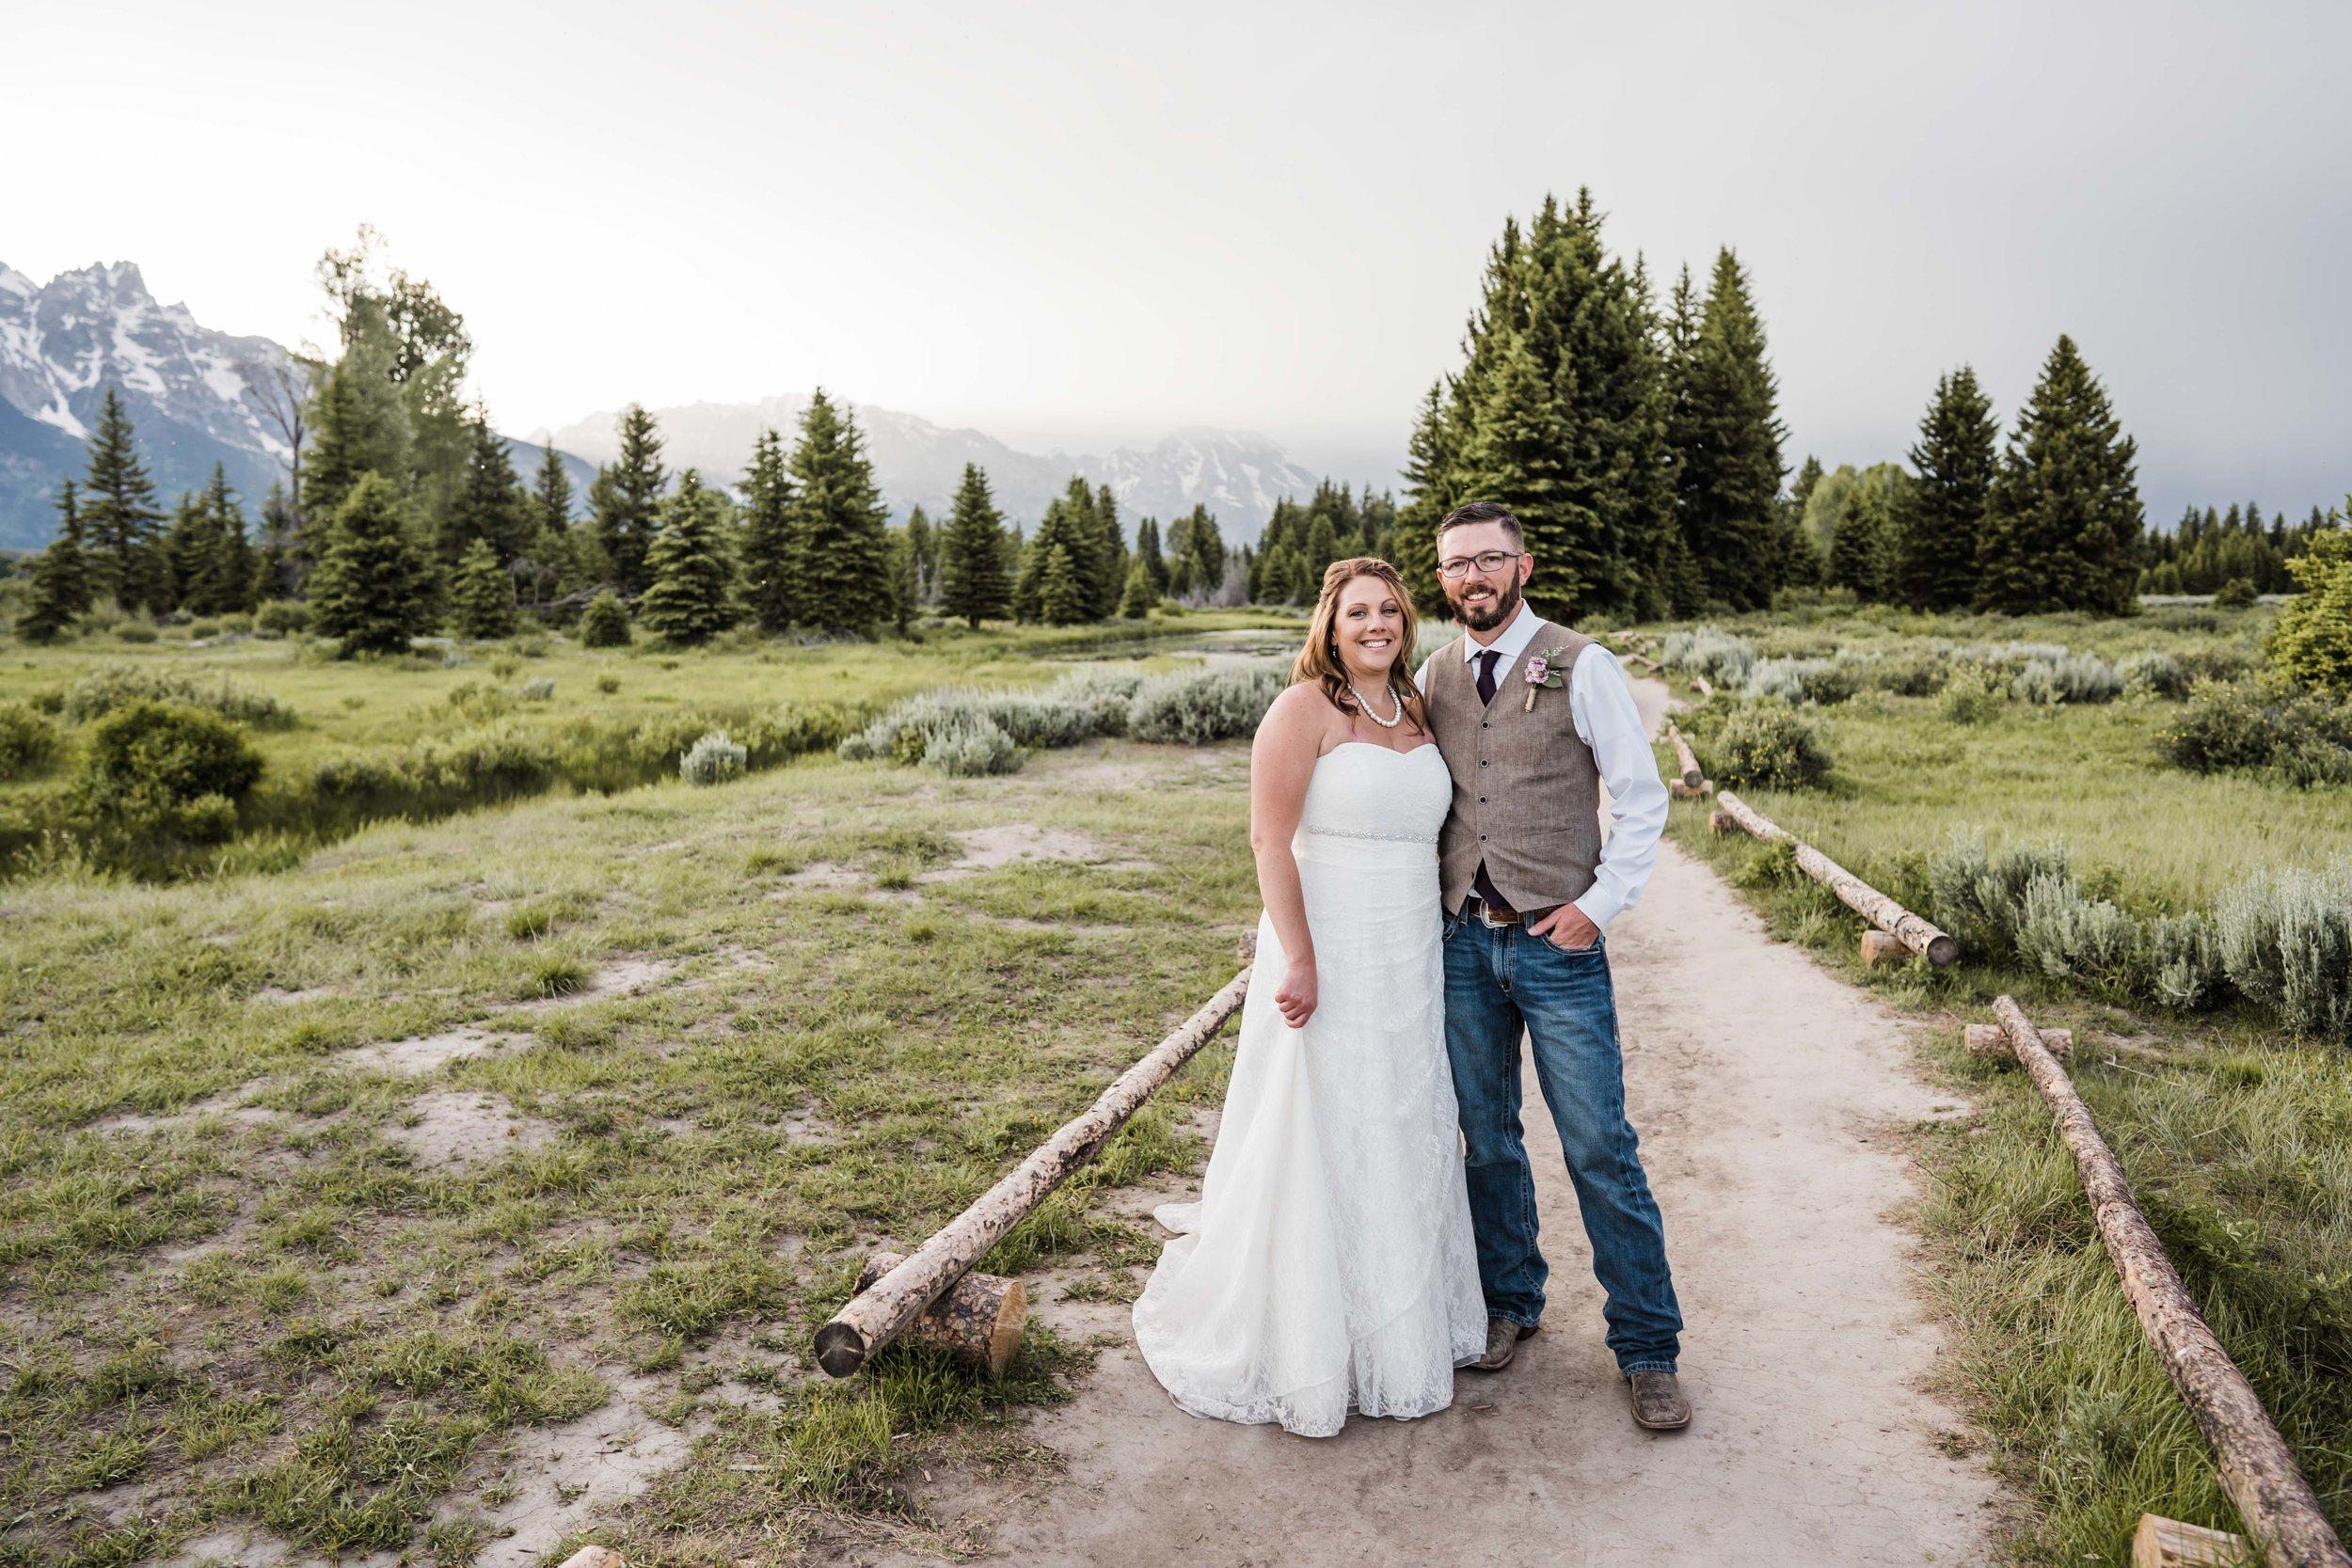 jackson hole adventure wedding photography at schwabachers landing in GTNP -DSD02011.jpg